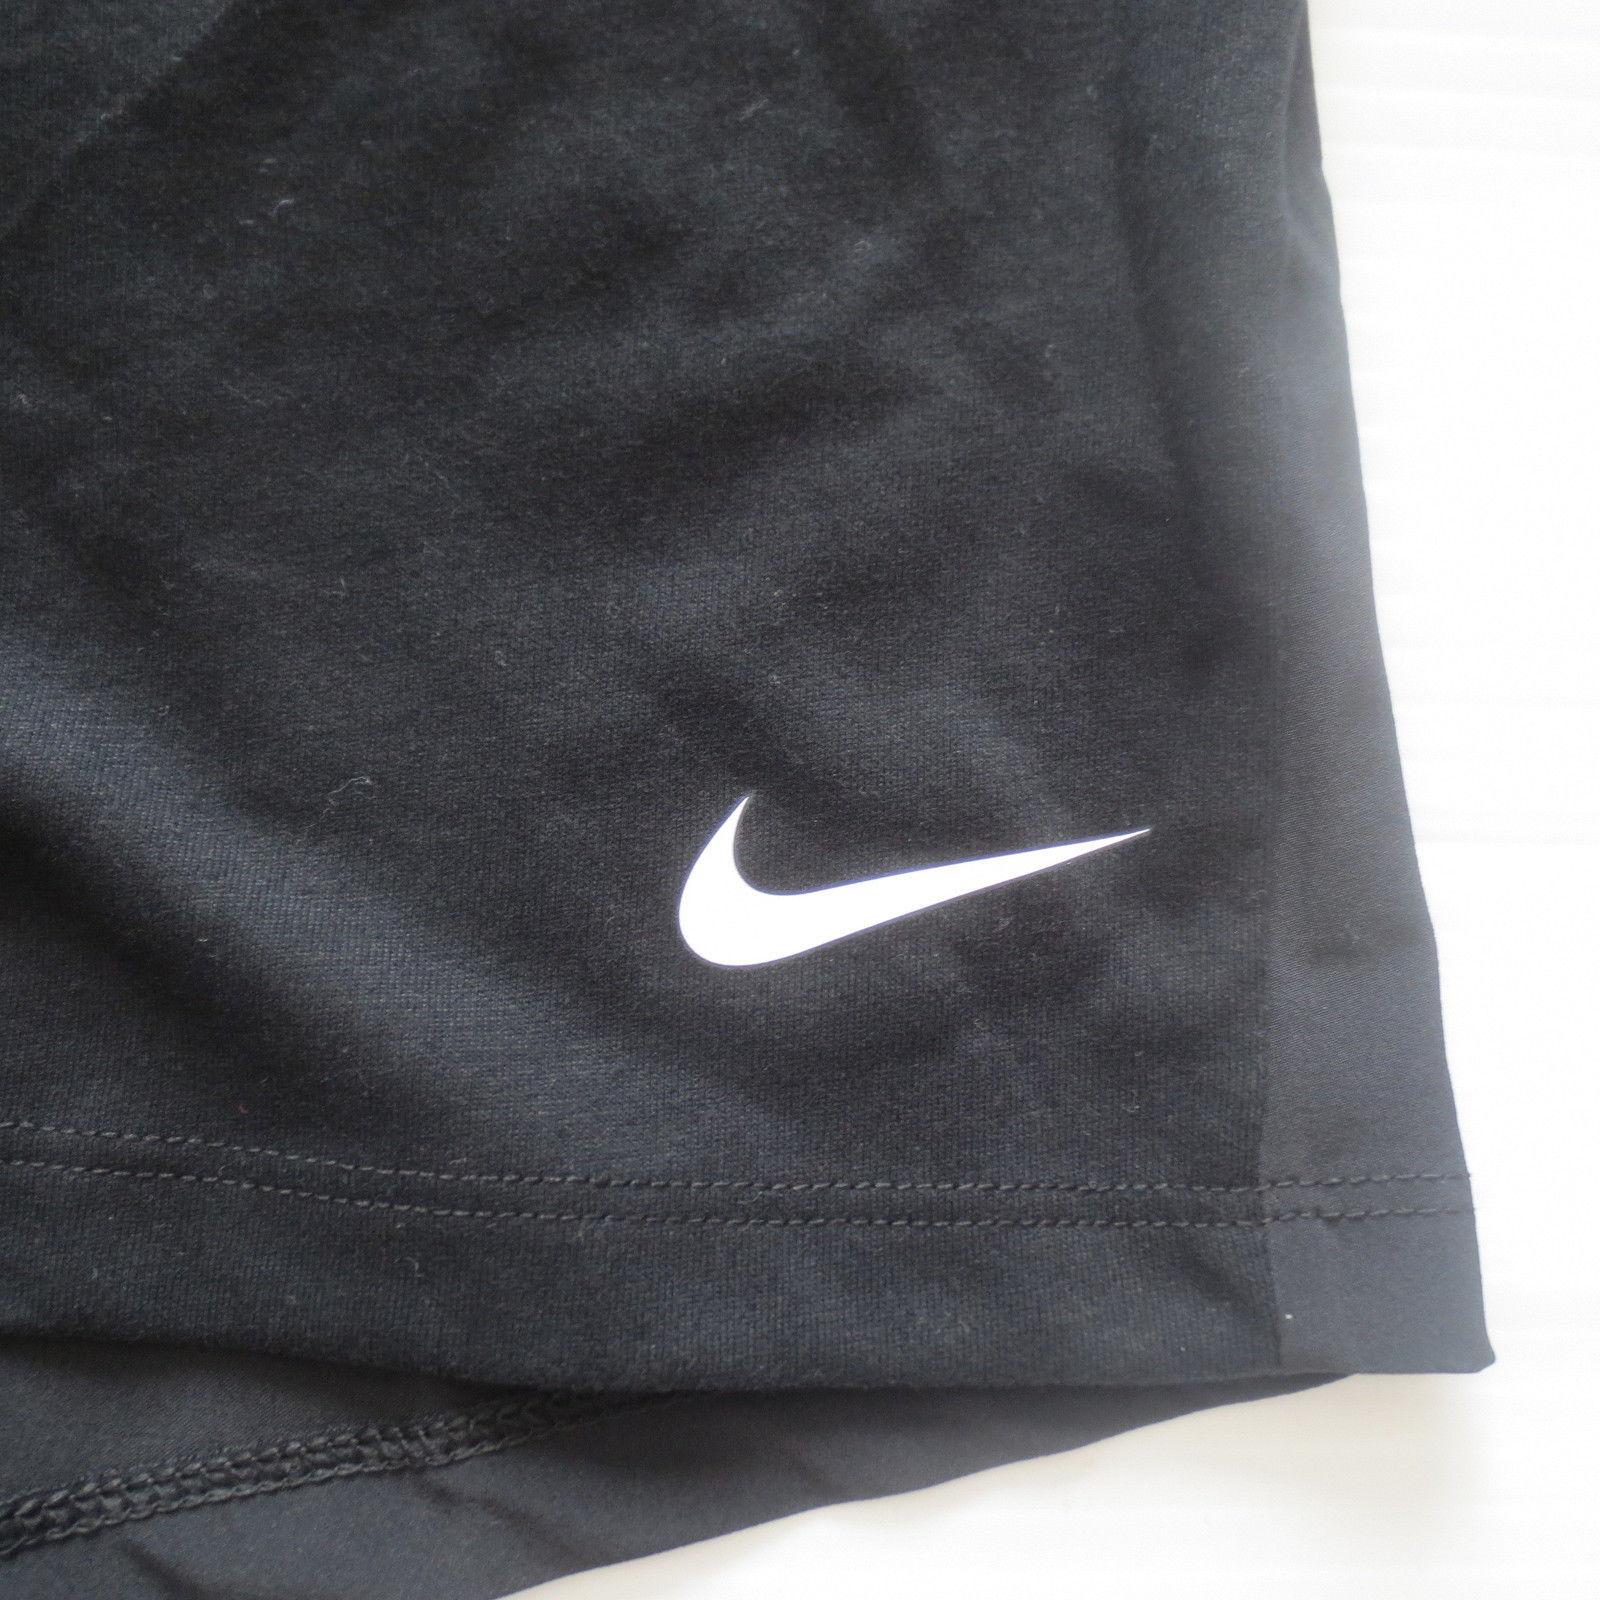 Nike Women Breathe Tank Top Shirt - 862774 - Black 010 - Size L - NWT image 2